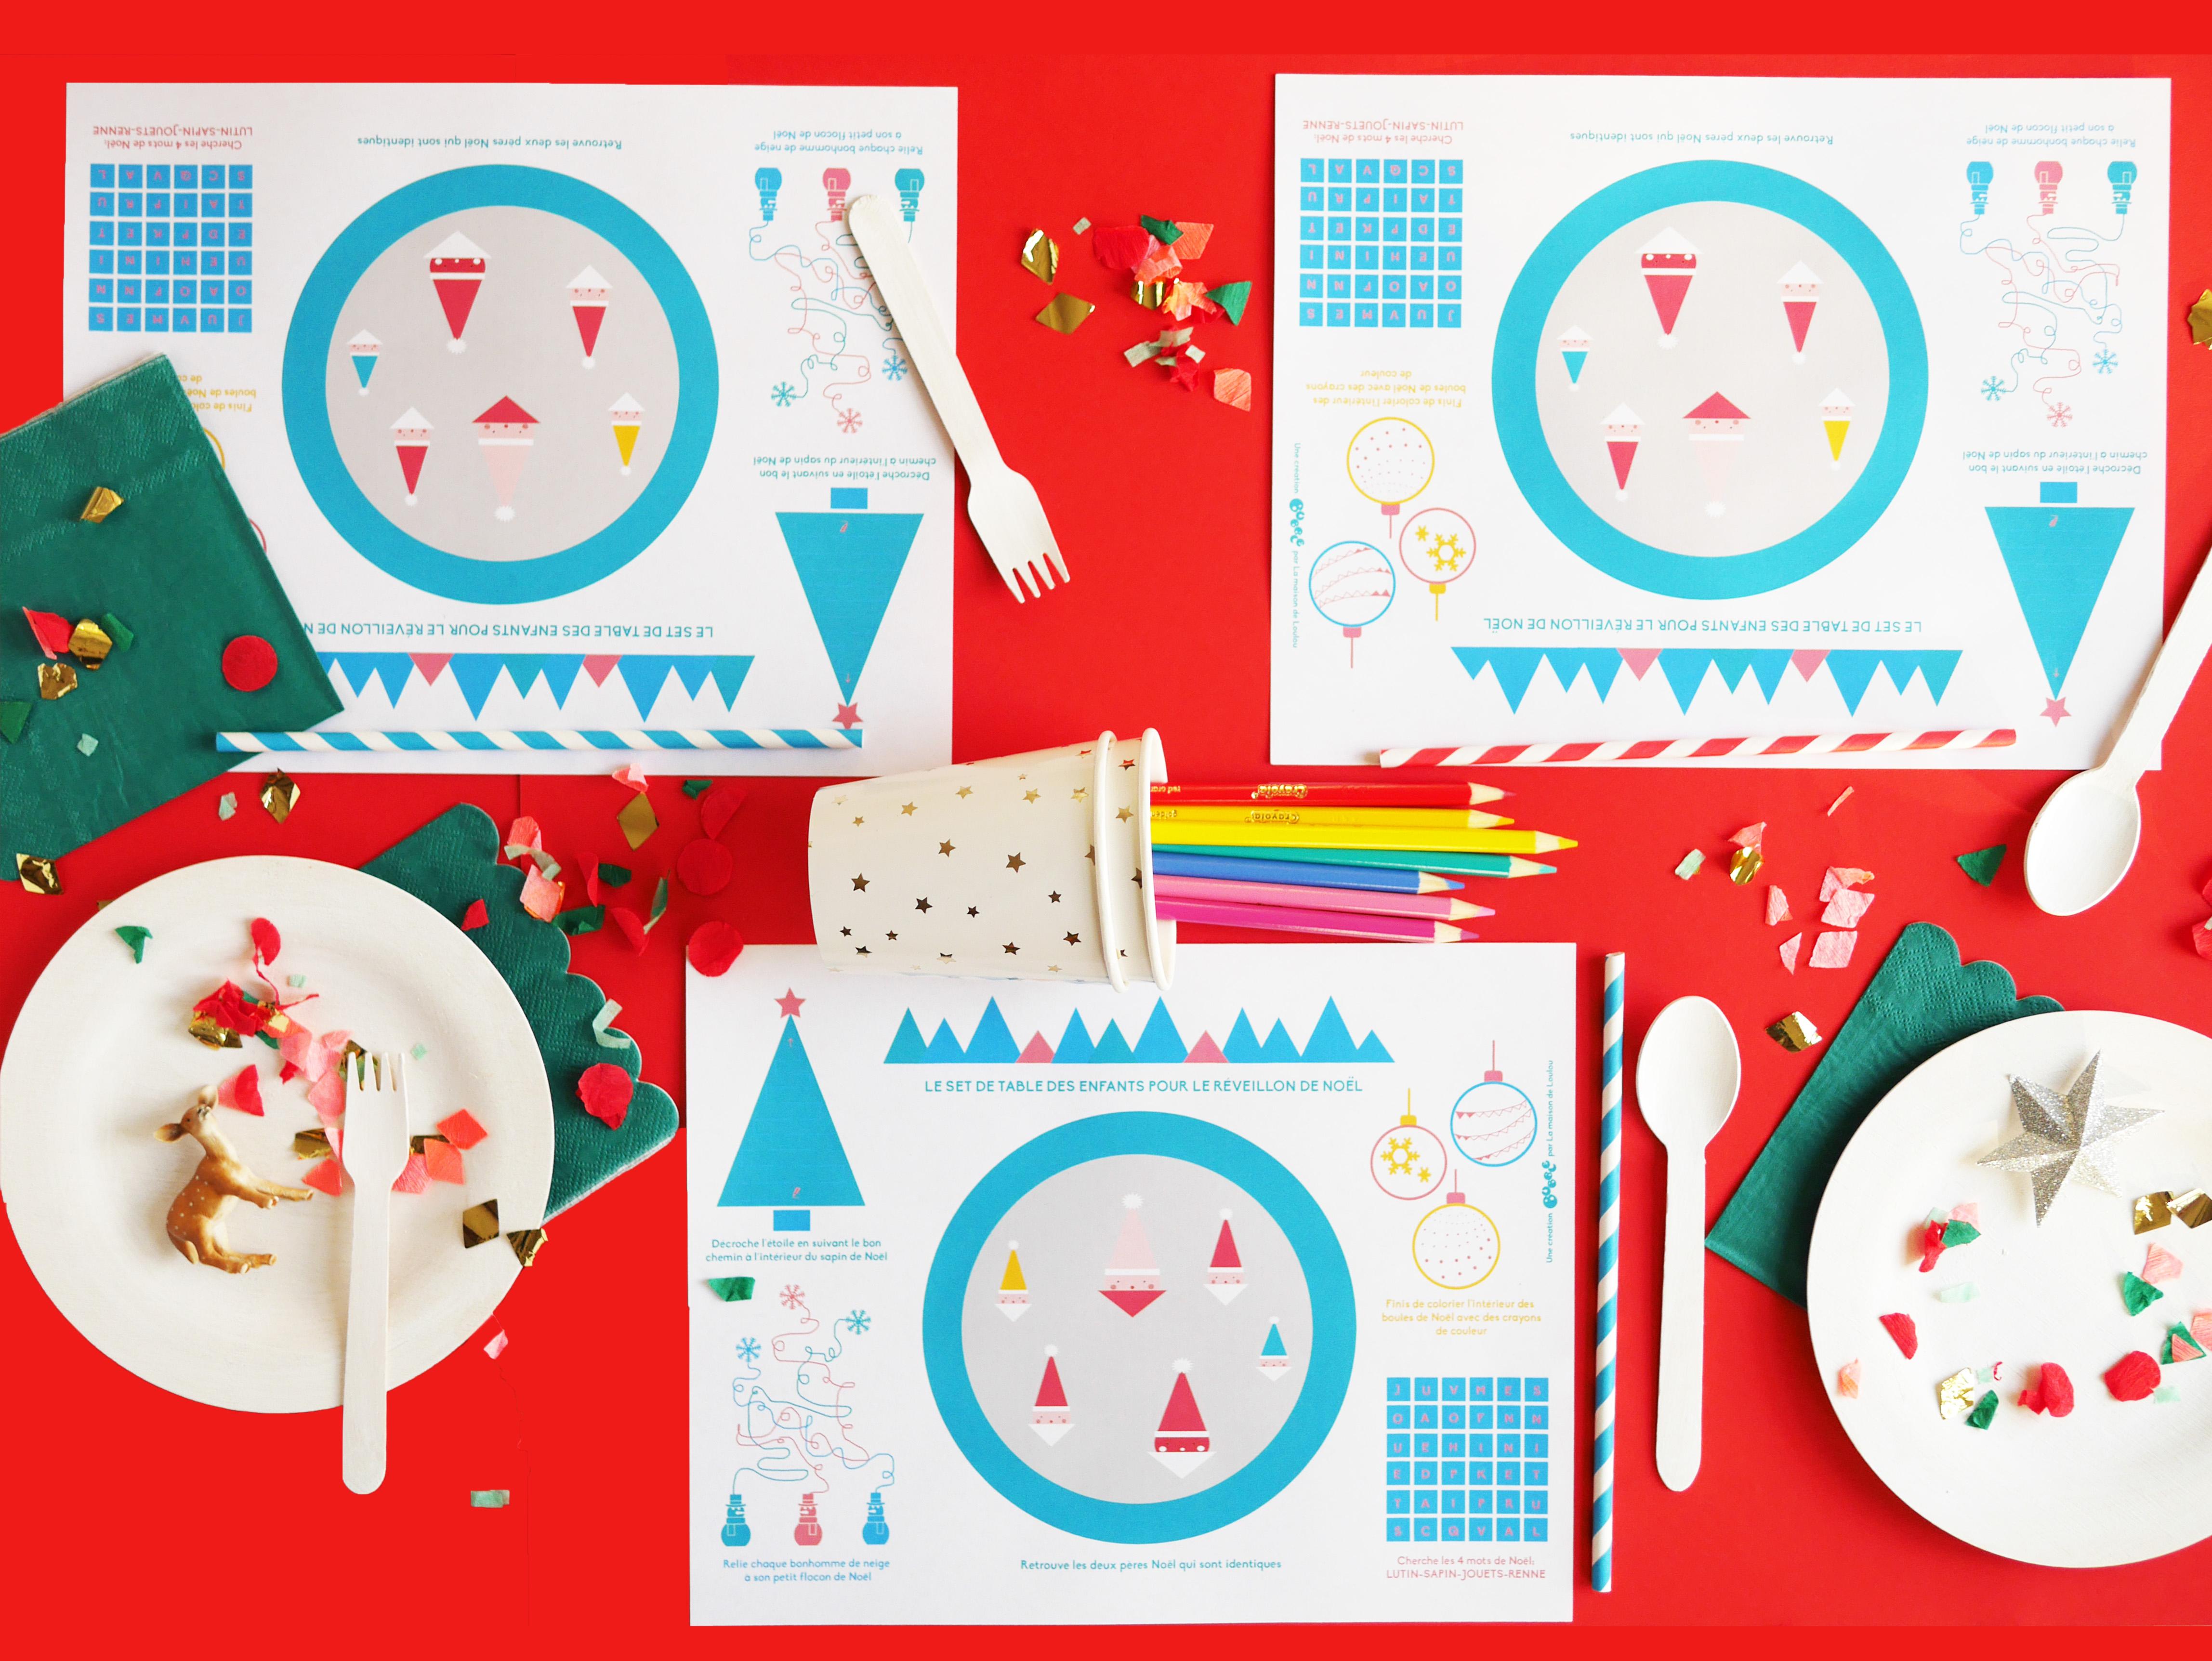 Interactive Free Printable Christmas Placematla Maison De Loulou   - Free Printable Christmas Placemats For Adults